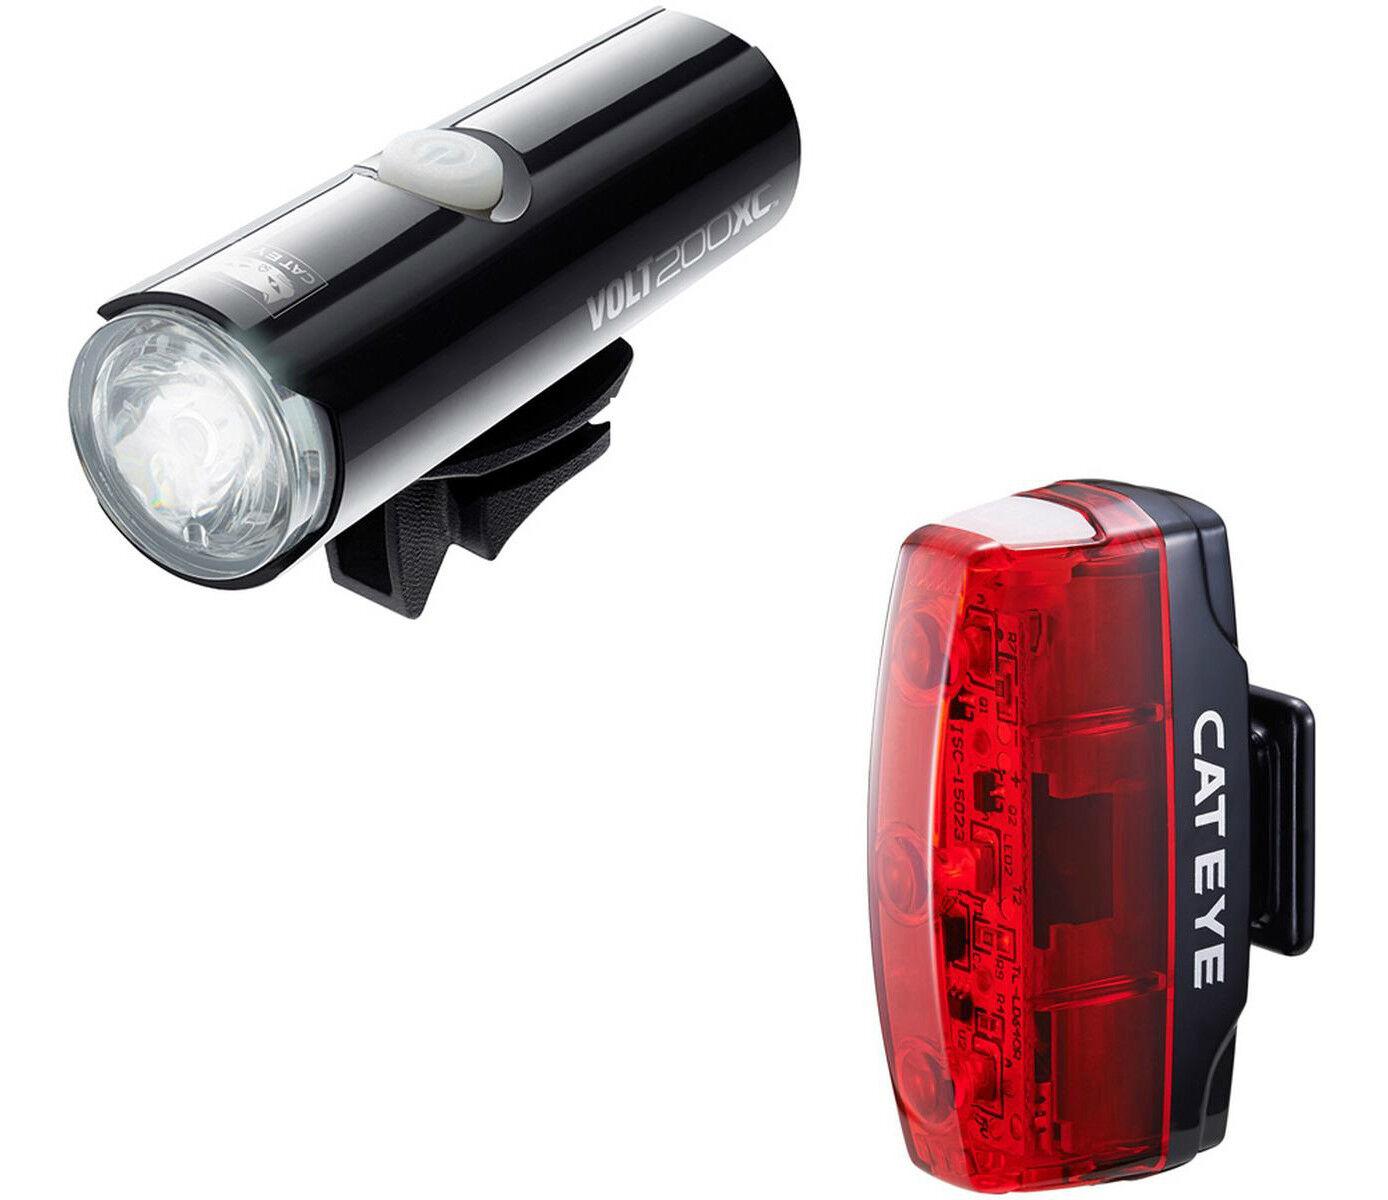 CatEye Set of 2 Bike Lights Volt 200XC & Rapid Micro